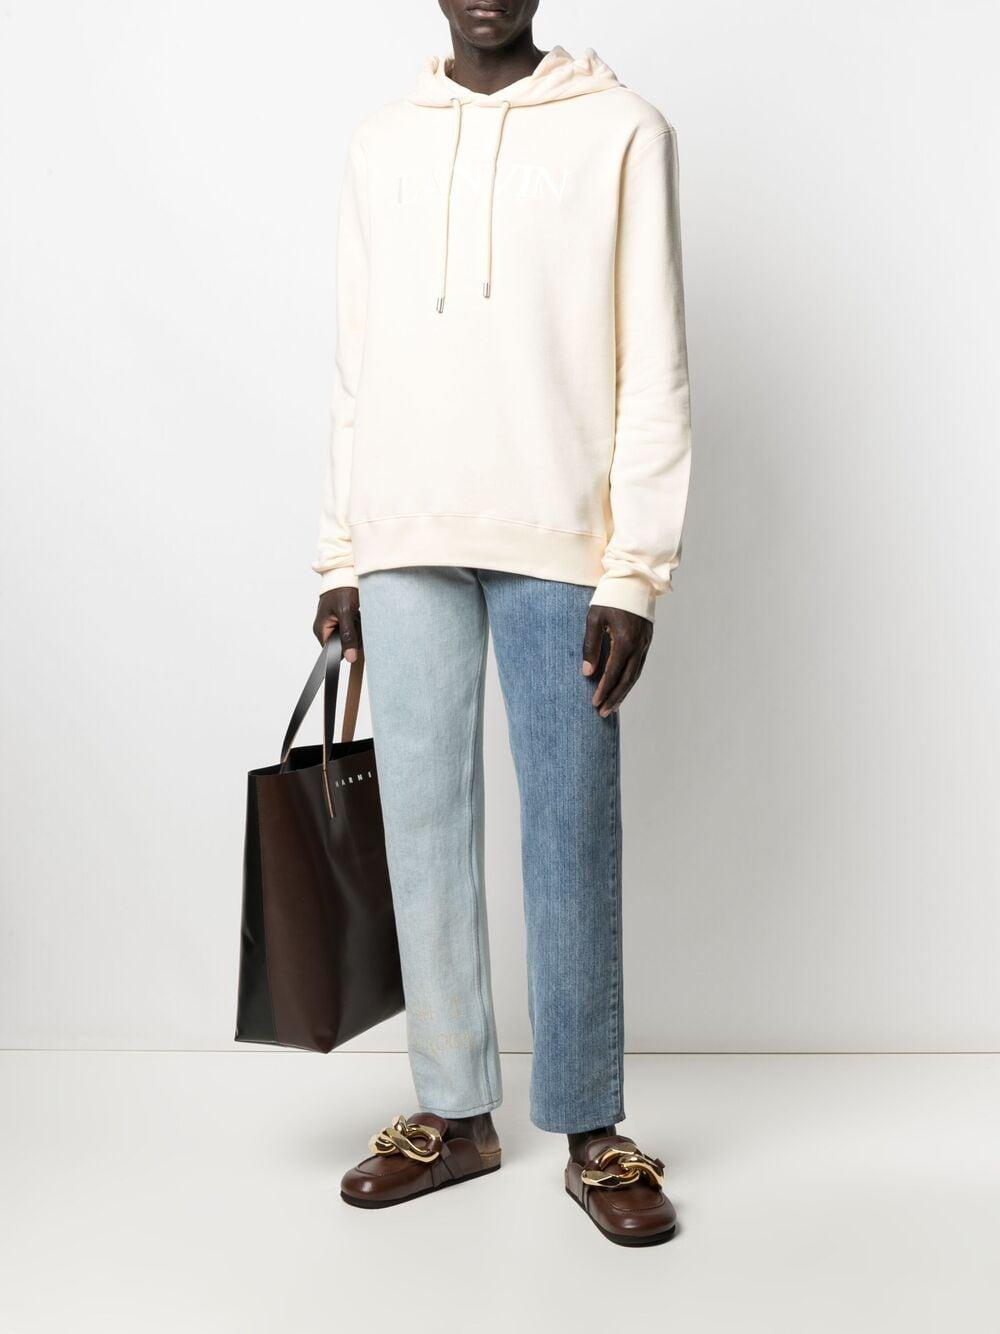 Lanvin embroidered logo sweatshirt man beige LANVIN   Sweatshirts   RM-HO0004-J008021